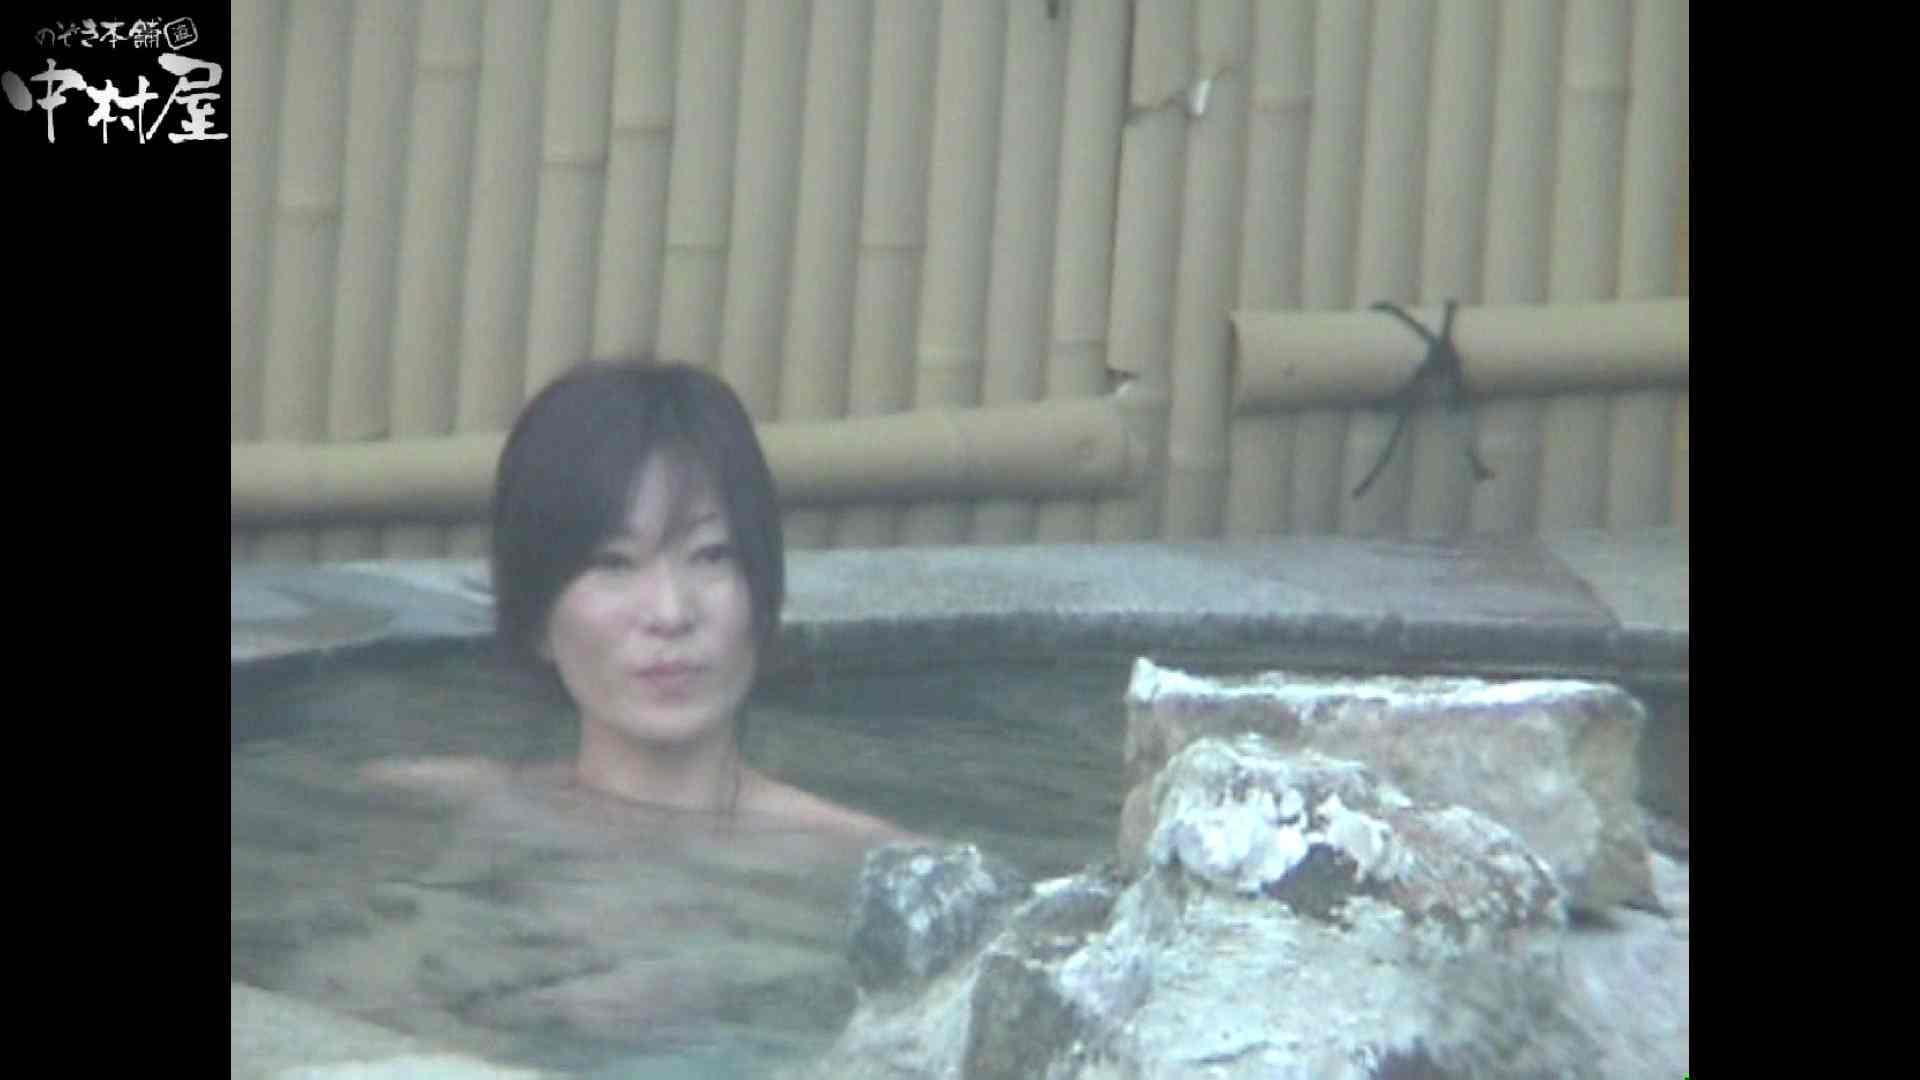 Aquaな露天風呂Vol.972 露天   OLセックス  80画像 34